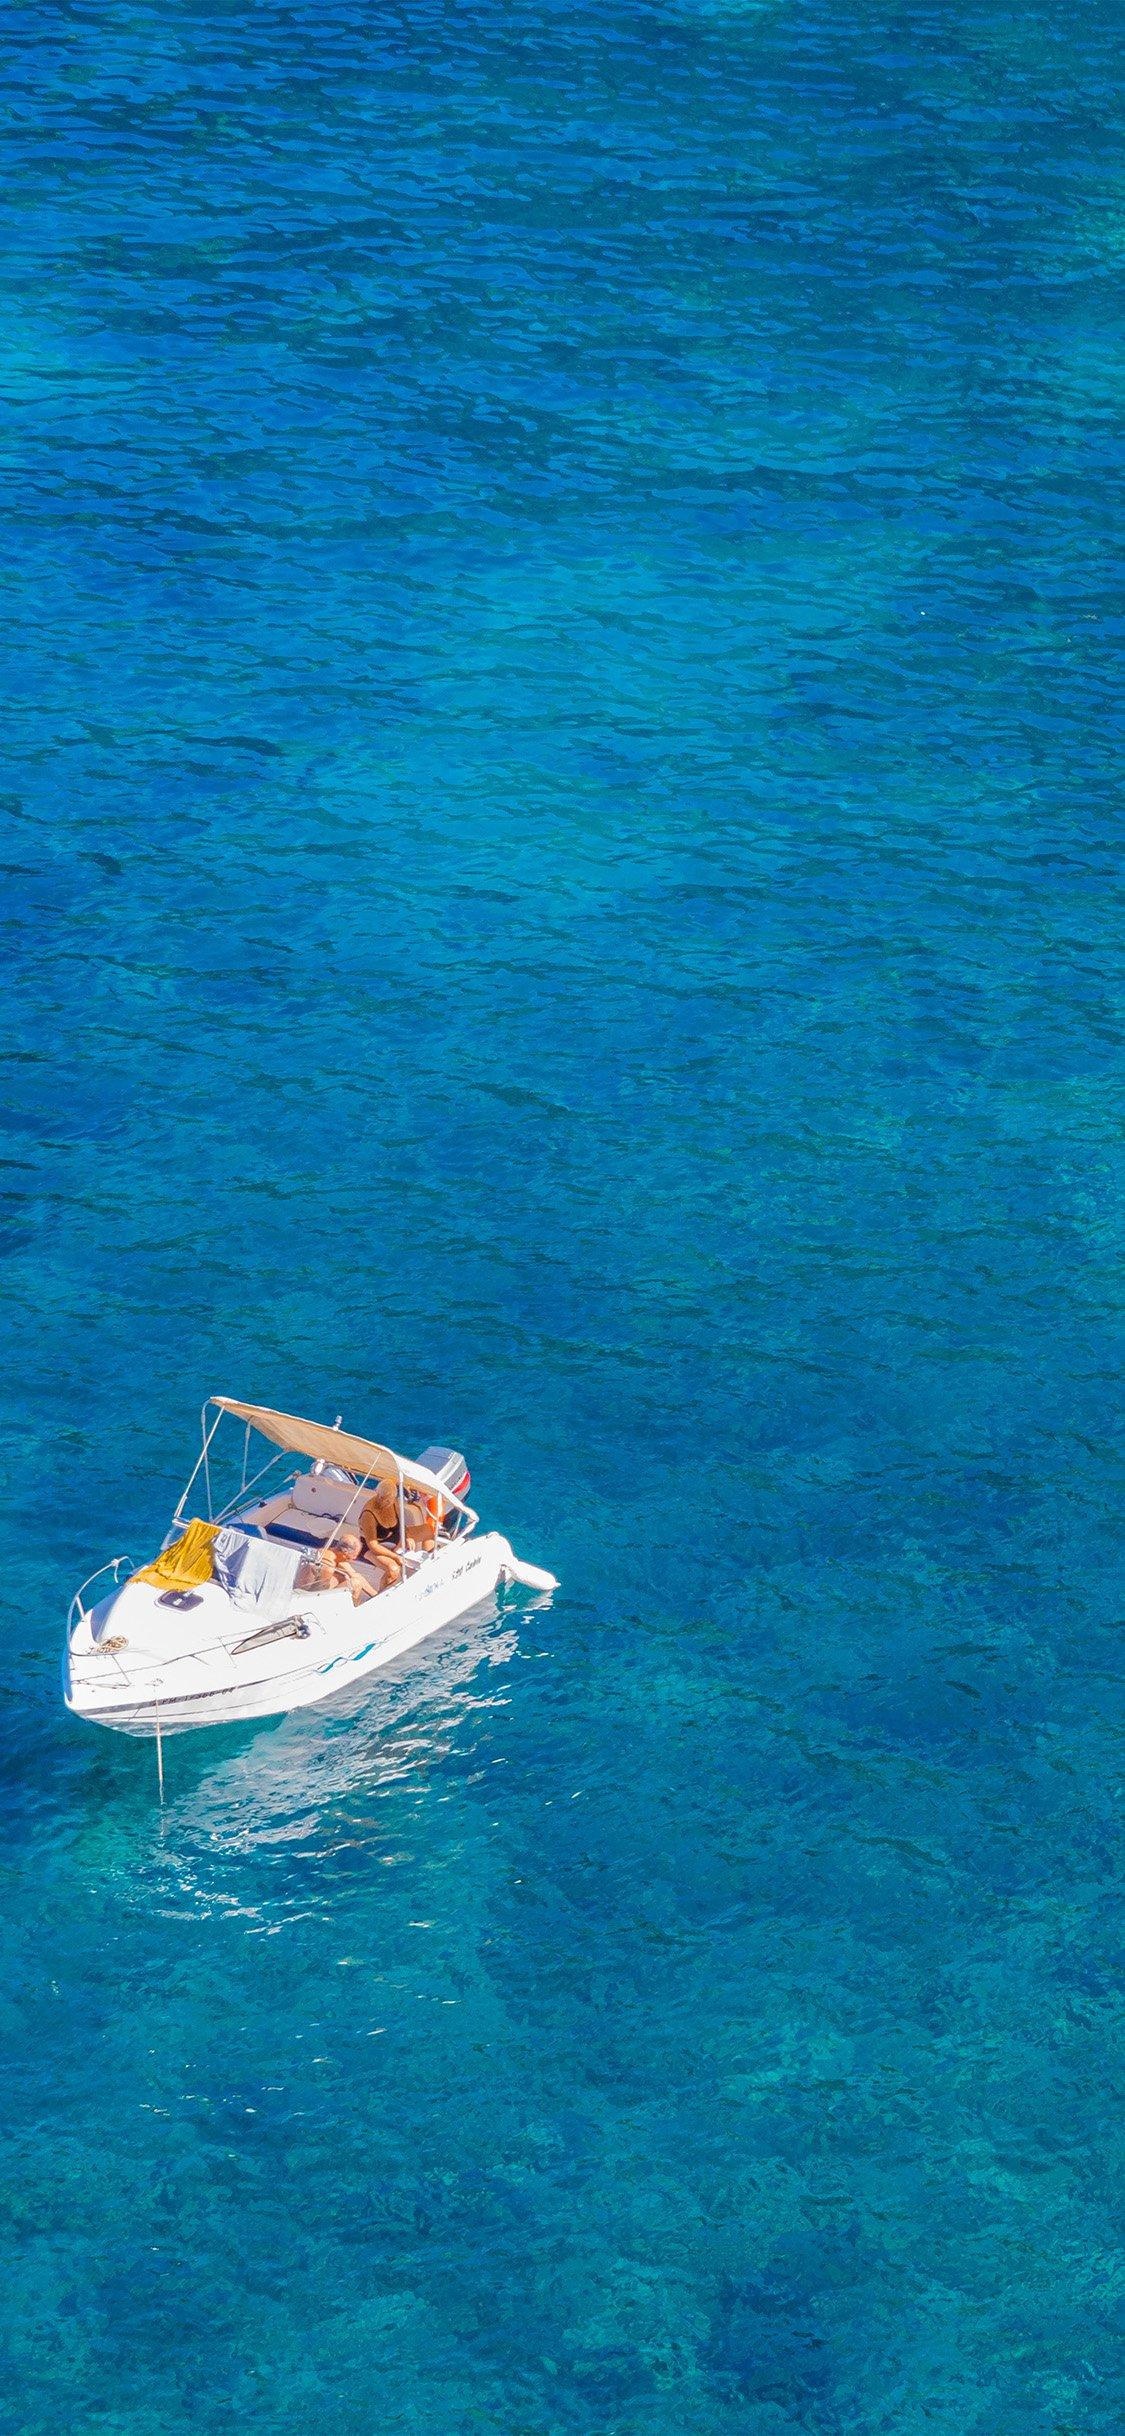 Sea wave ocean blue summer iPhone X wallpaper